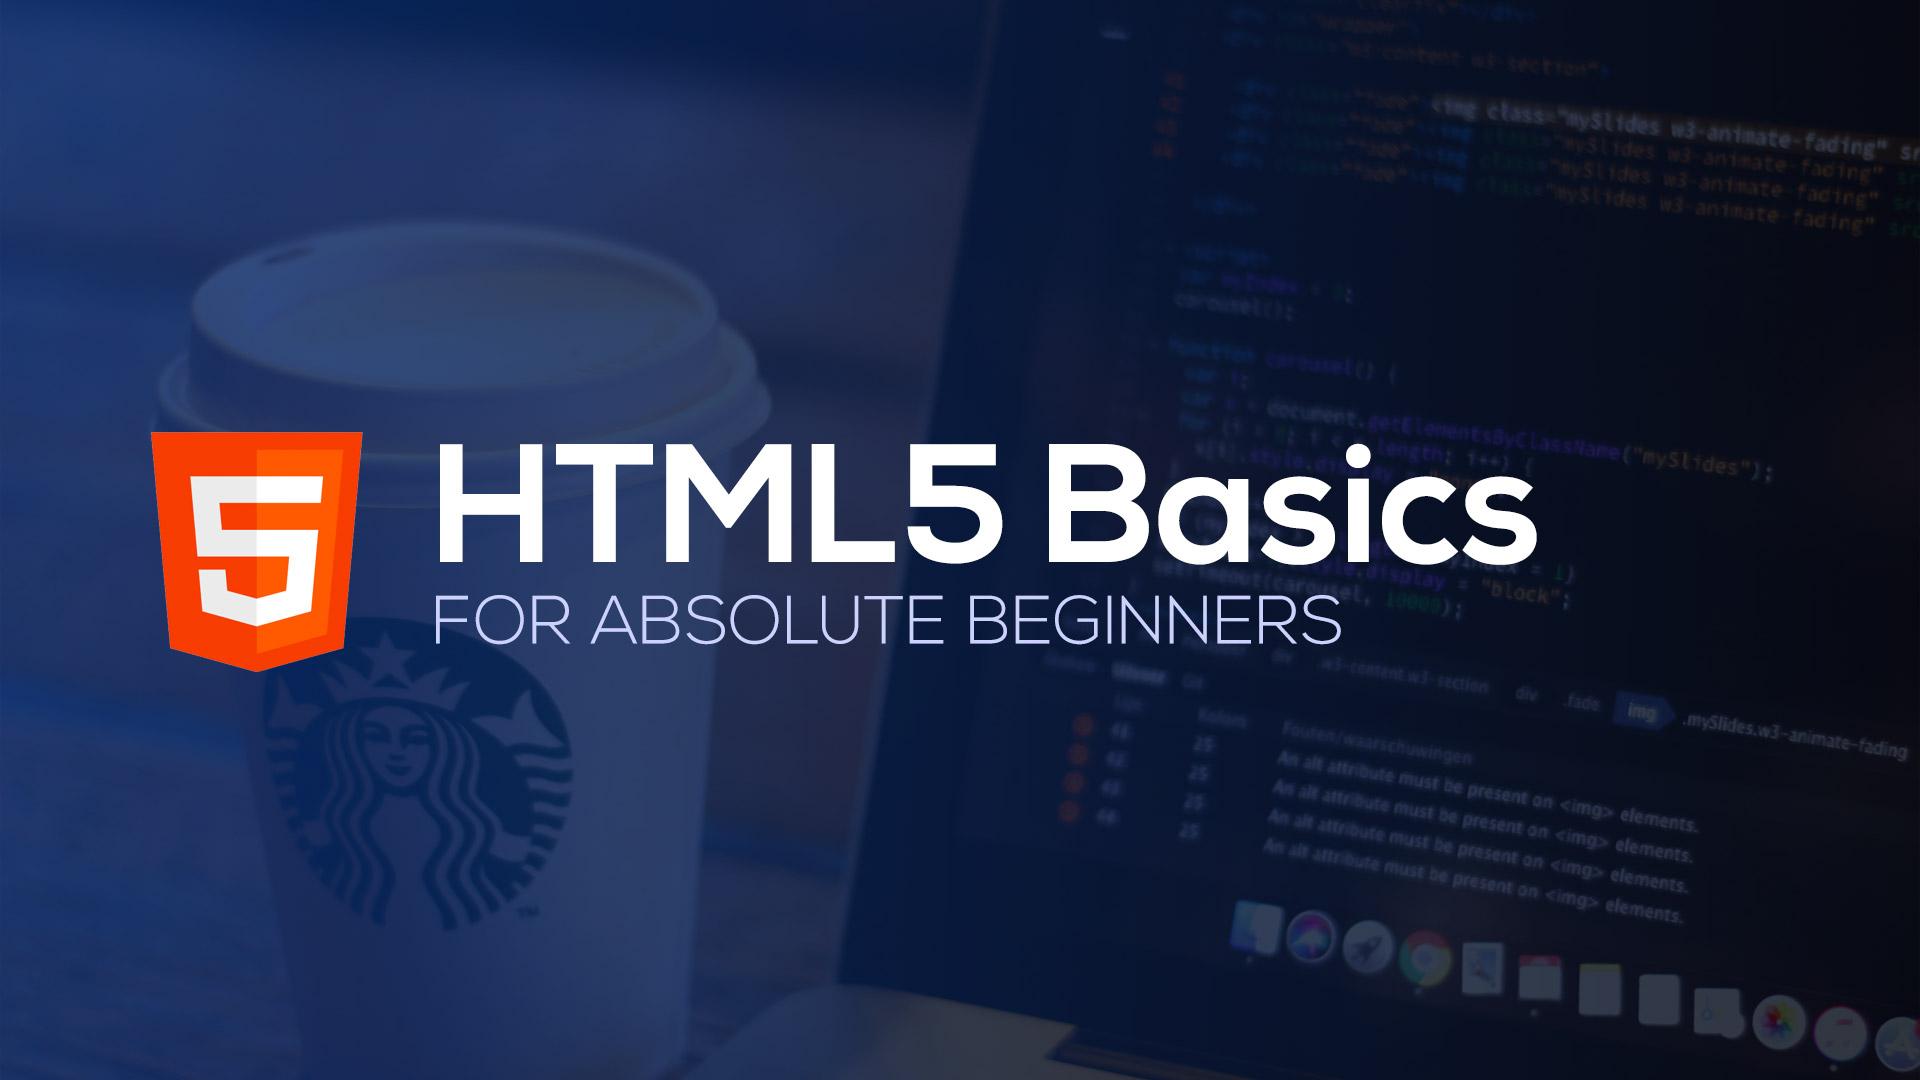 HTML5 Basics for Absolute Beginners